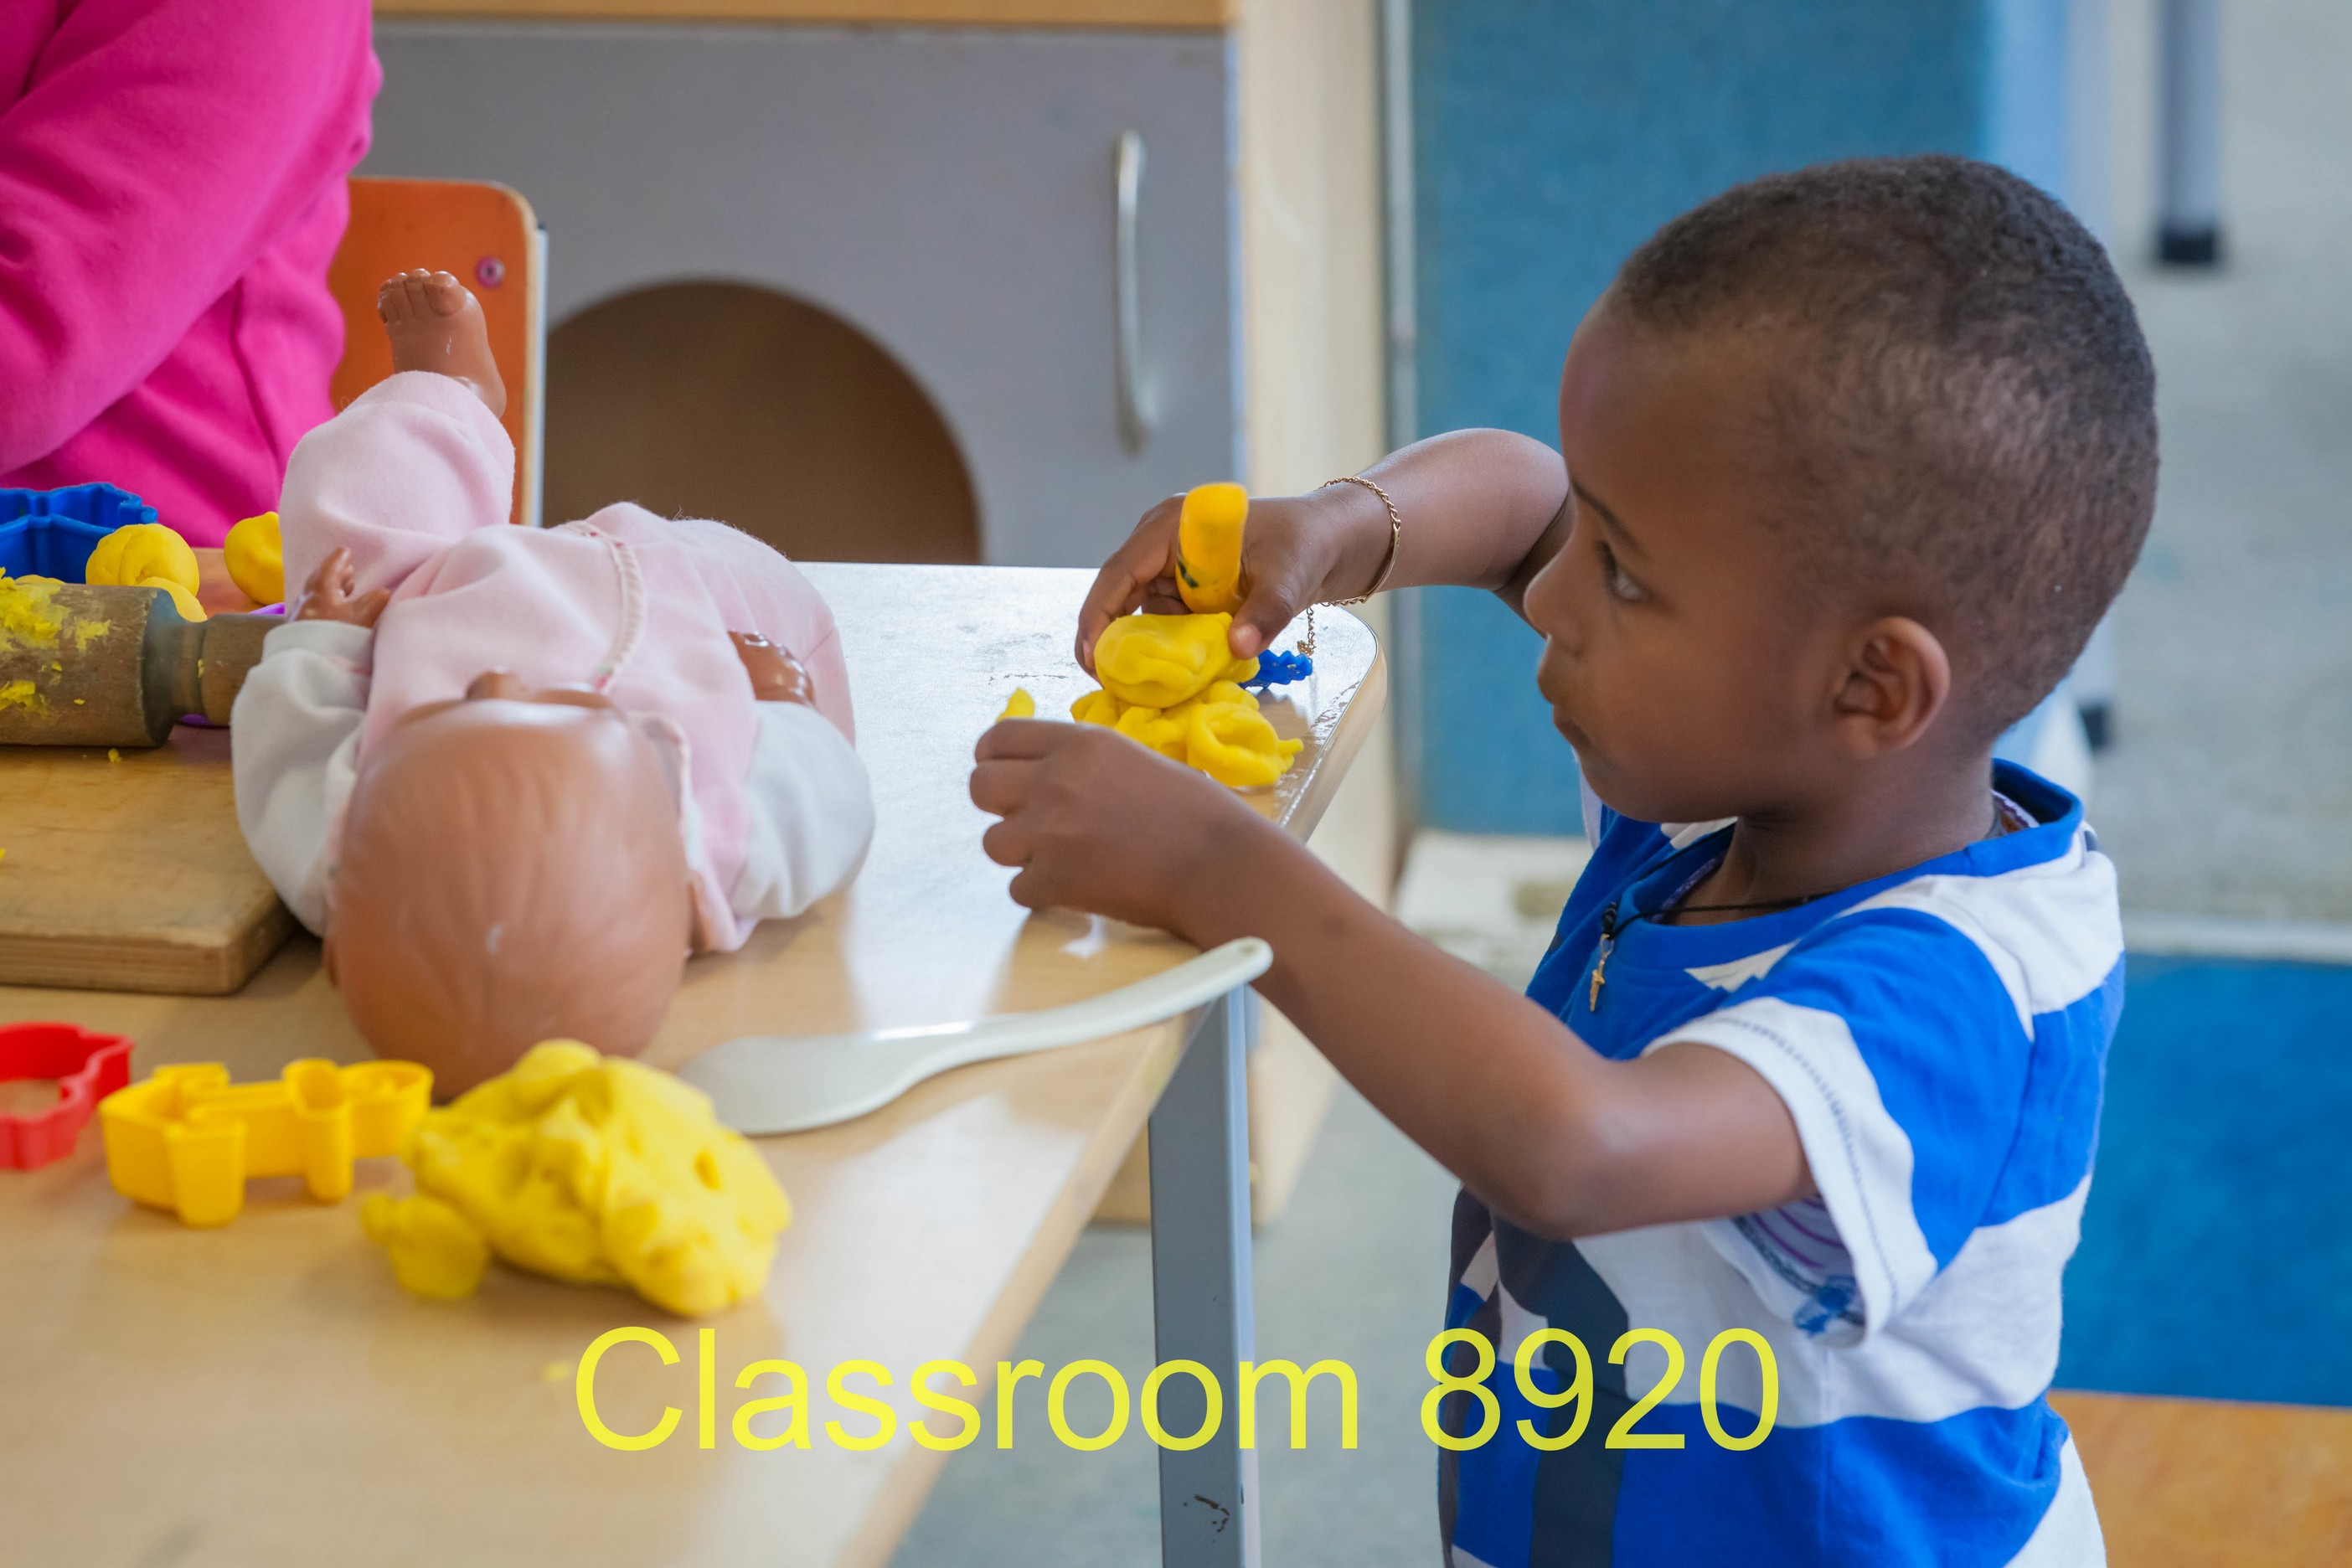 Classroom 8920